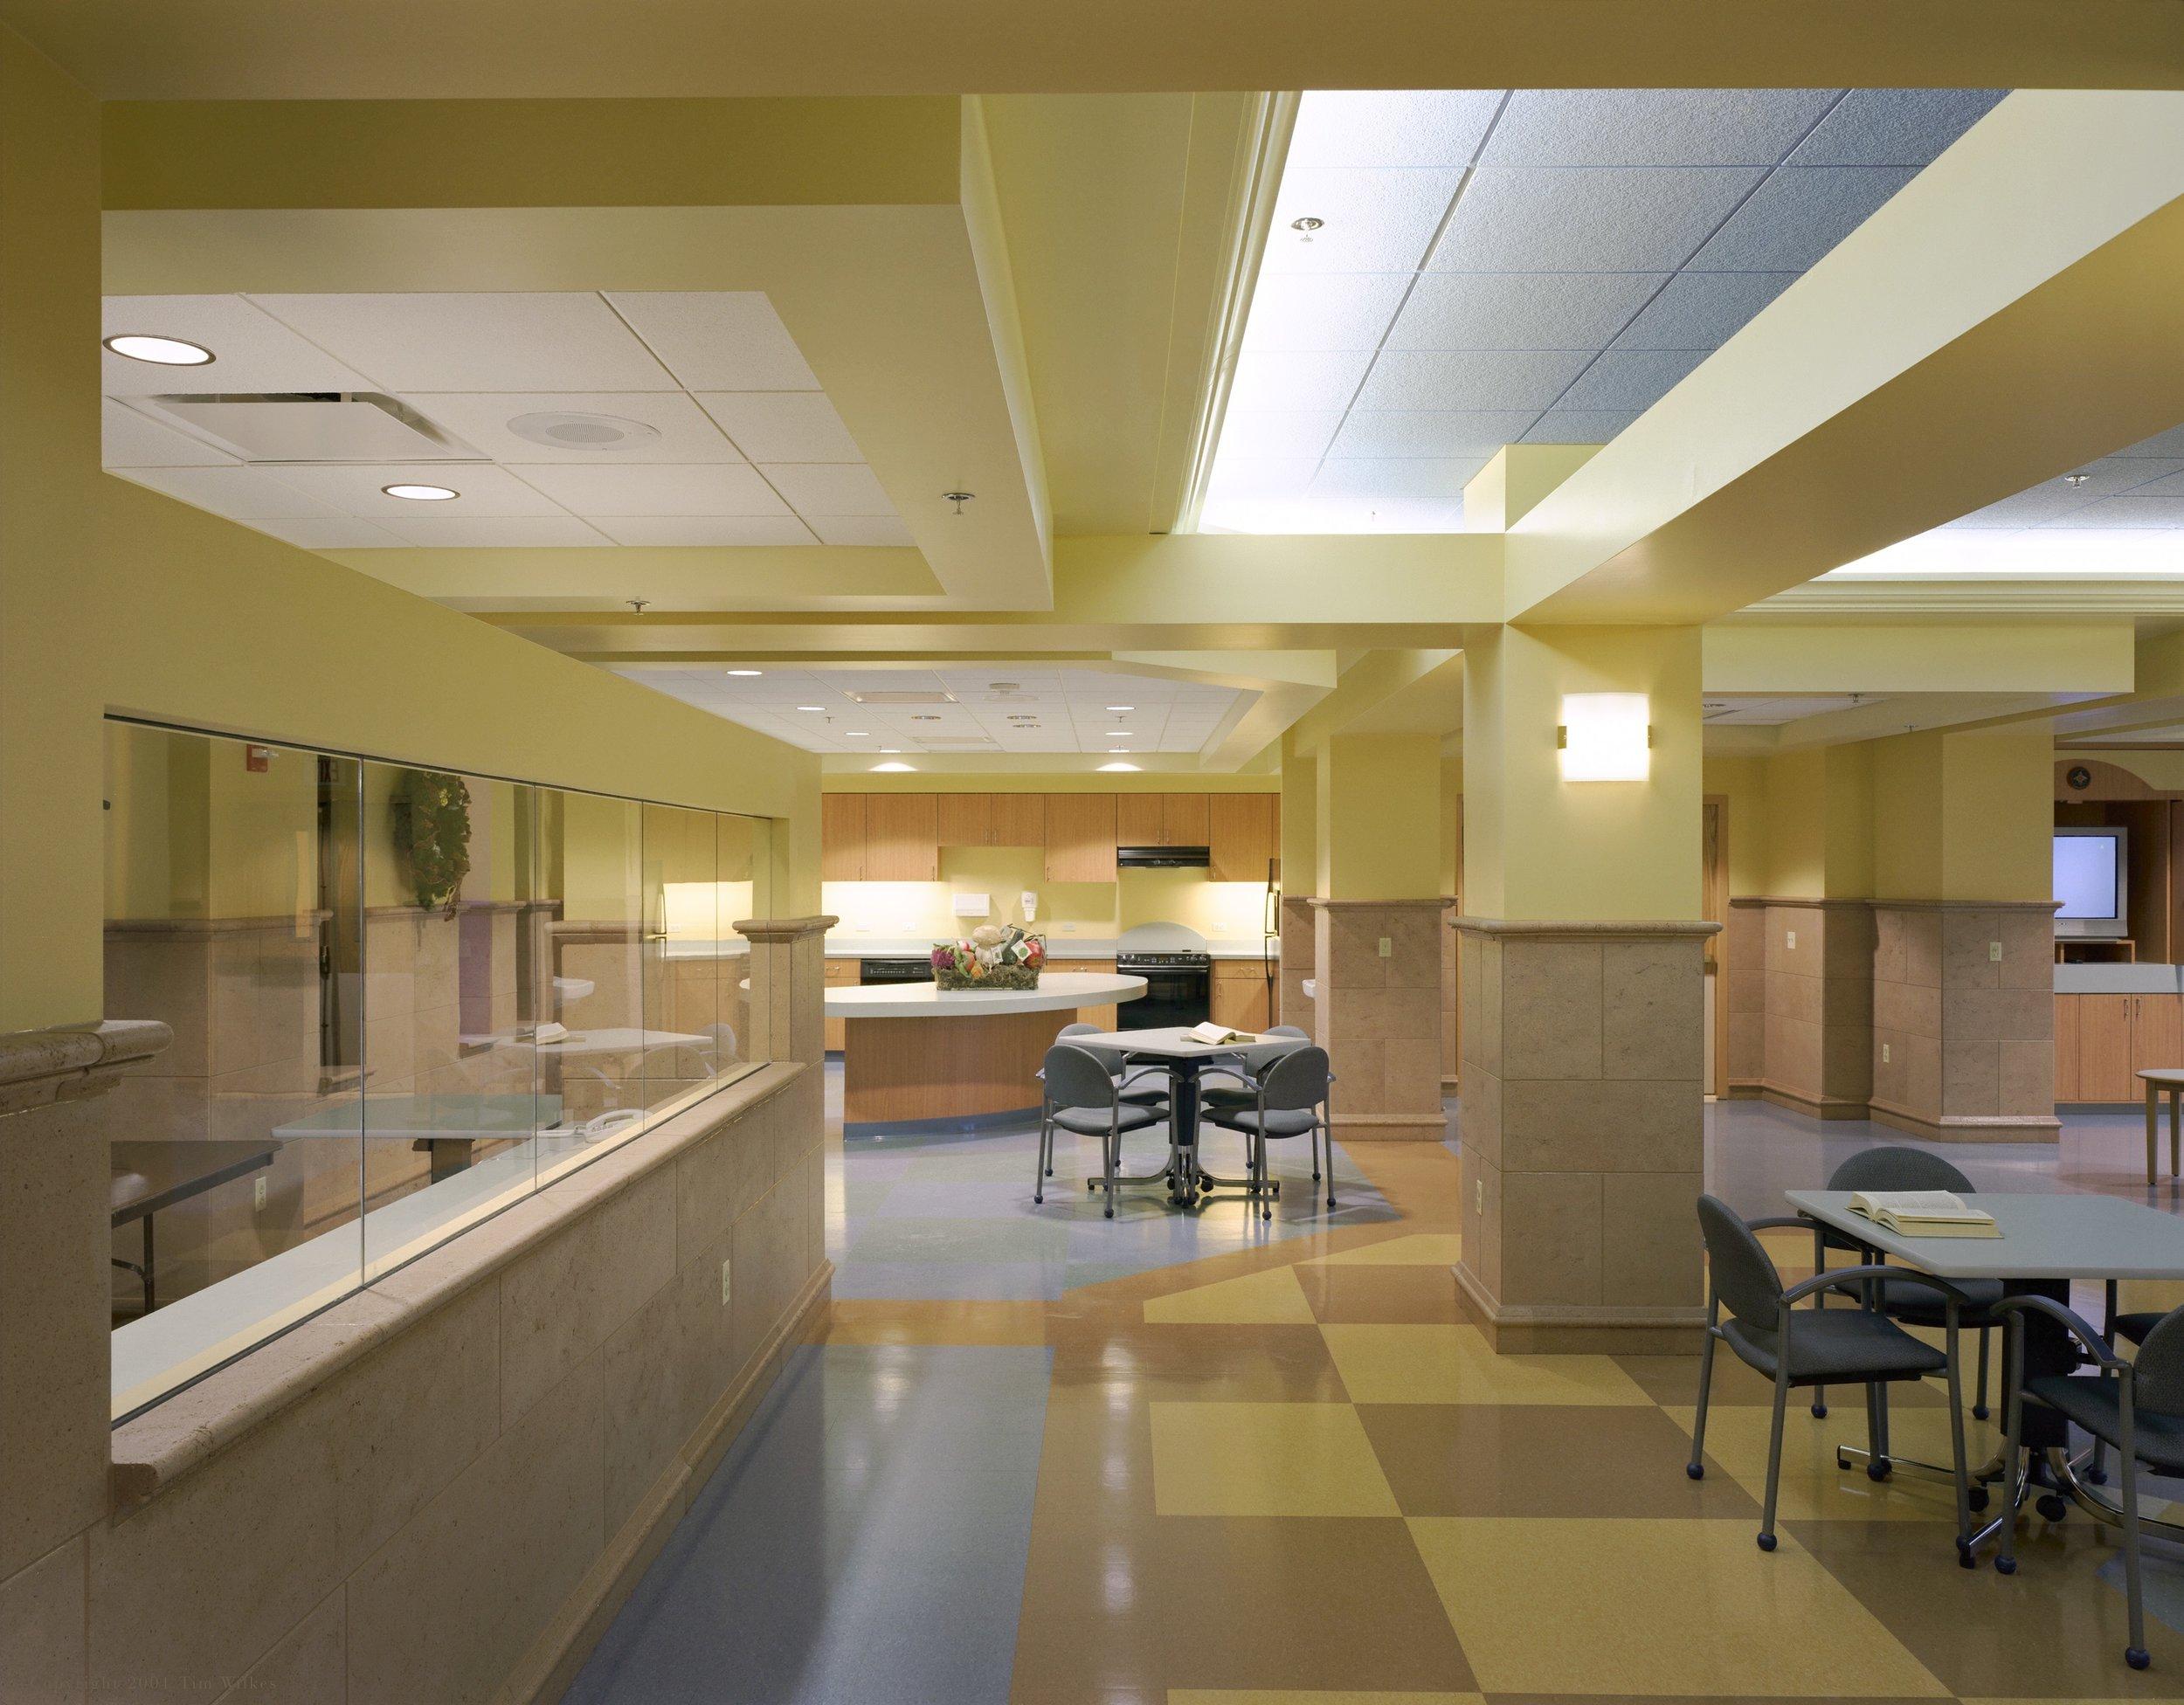 Monroe County Hospital Adult Care